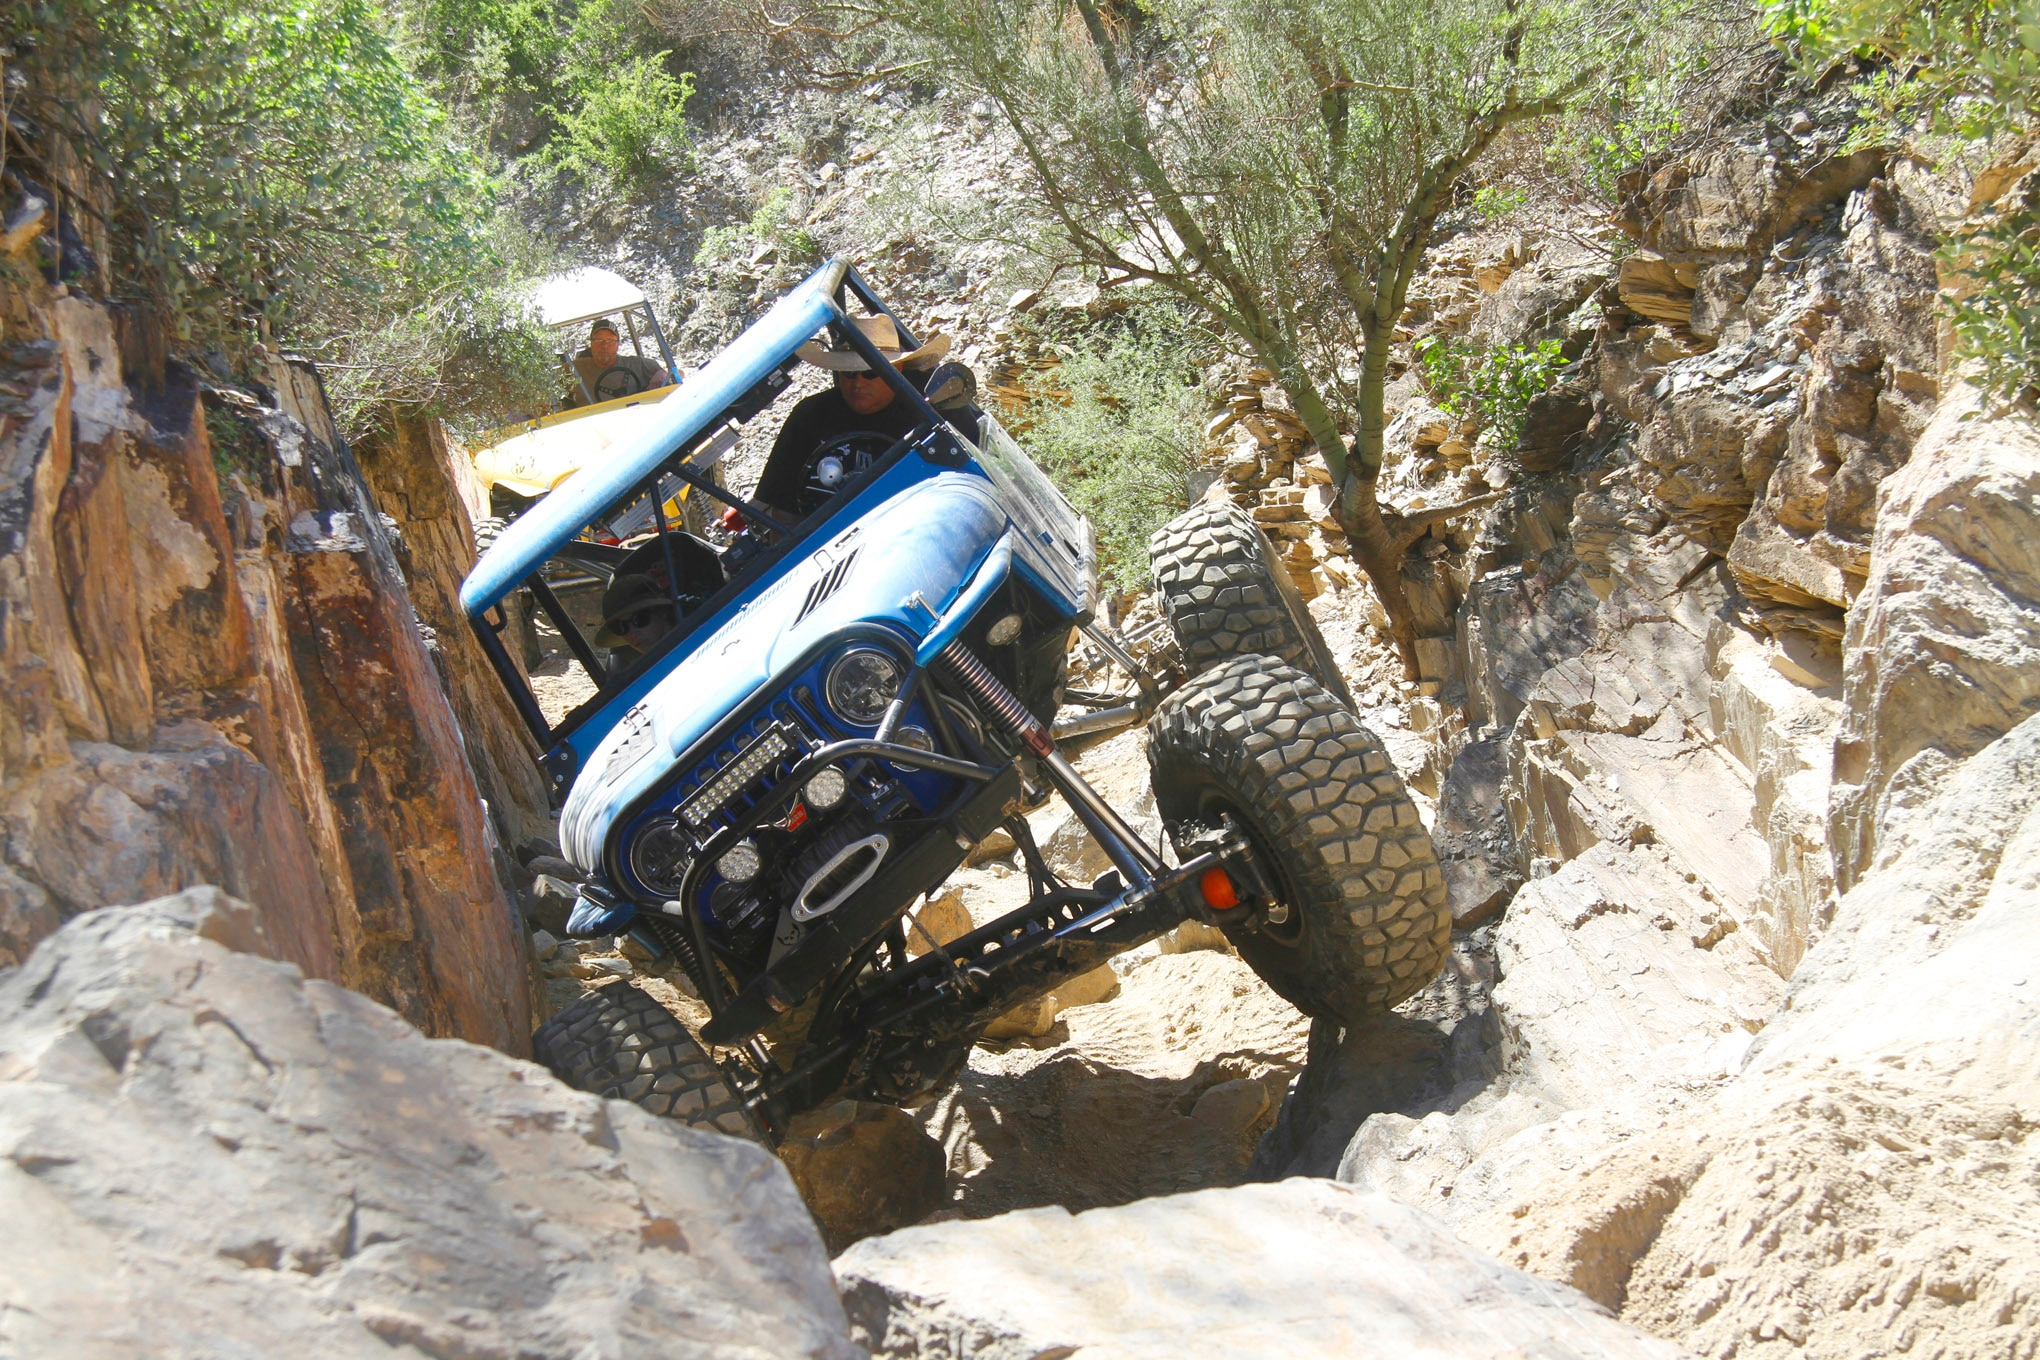 035 table mesa trails up anaconda 1976 cj7